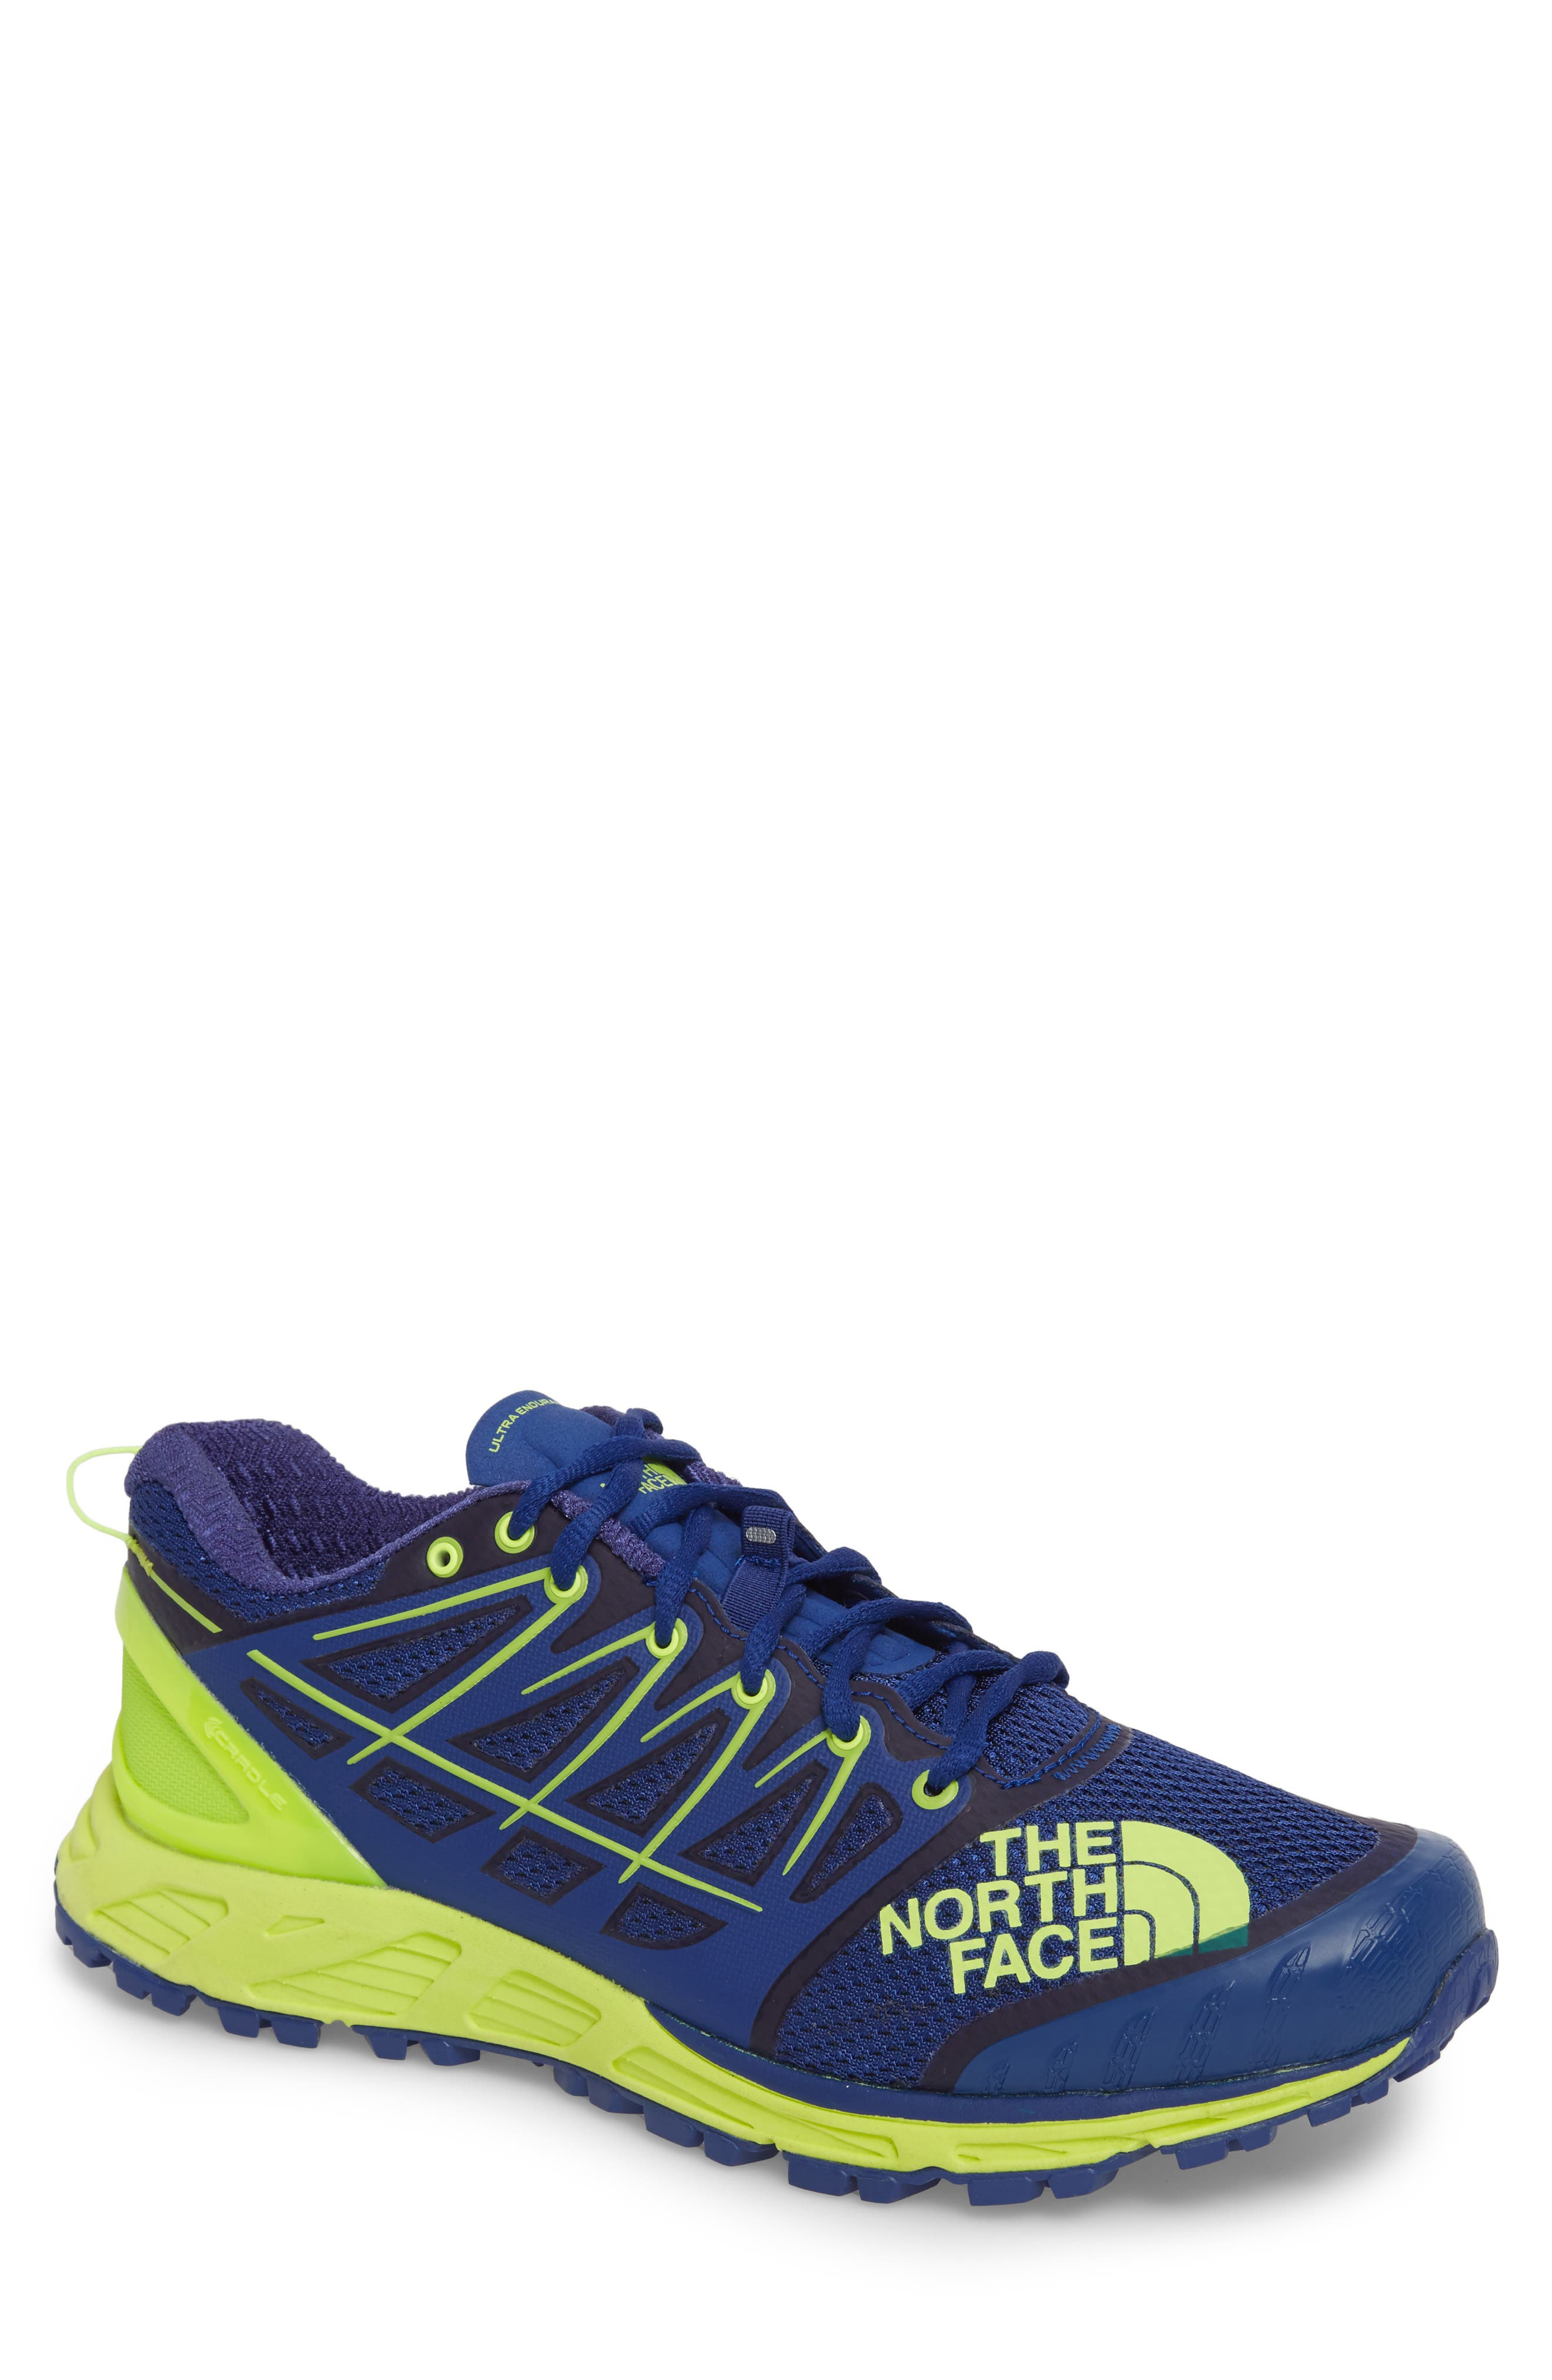 7b4ef94df4d THE NORTH FACE Ultra Endurance Ii Trail Running Shoe